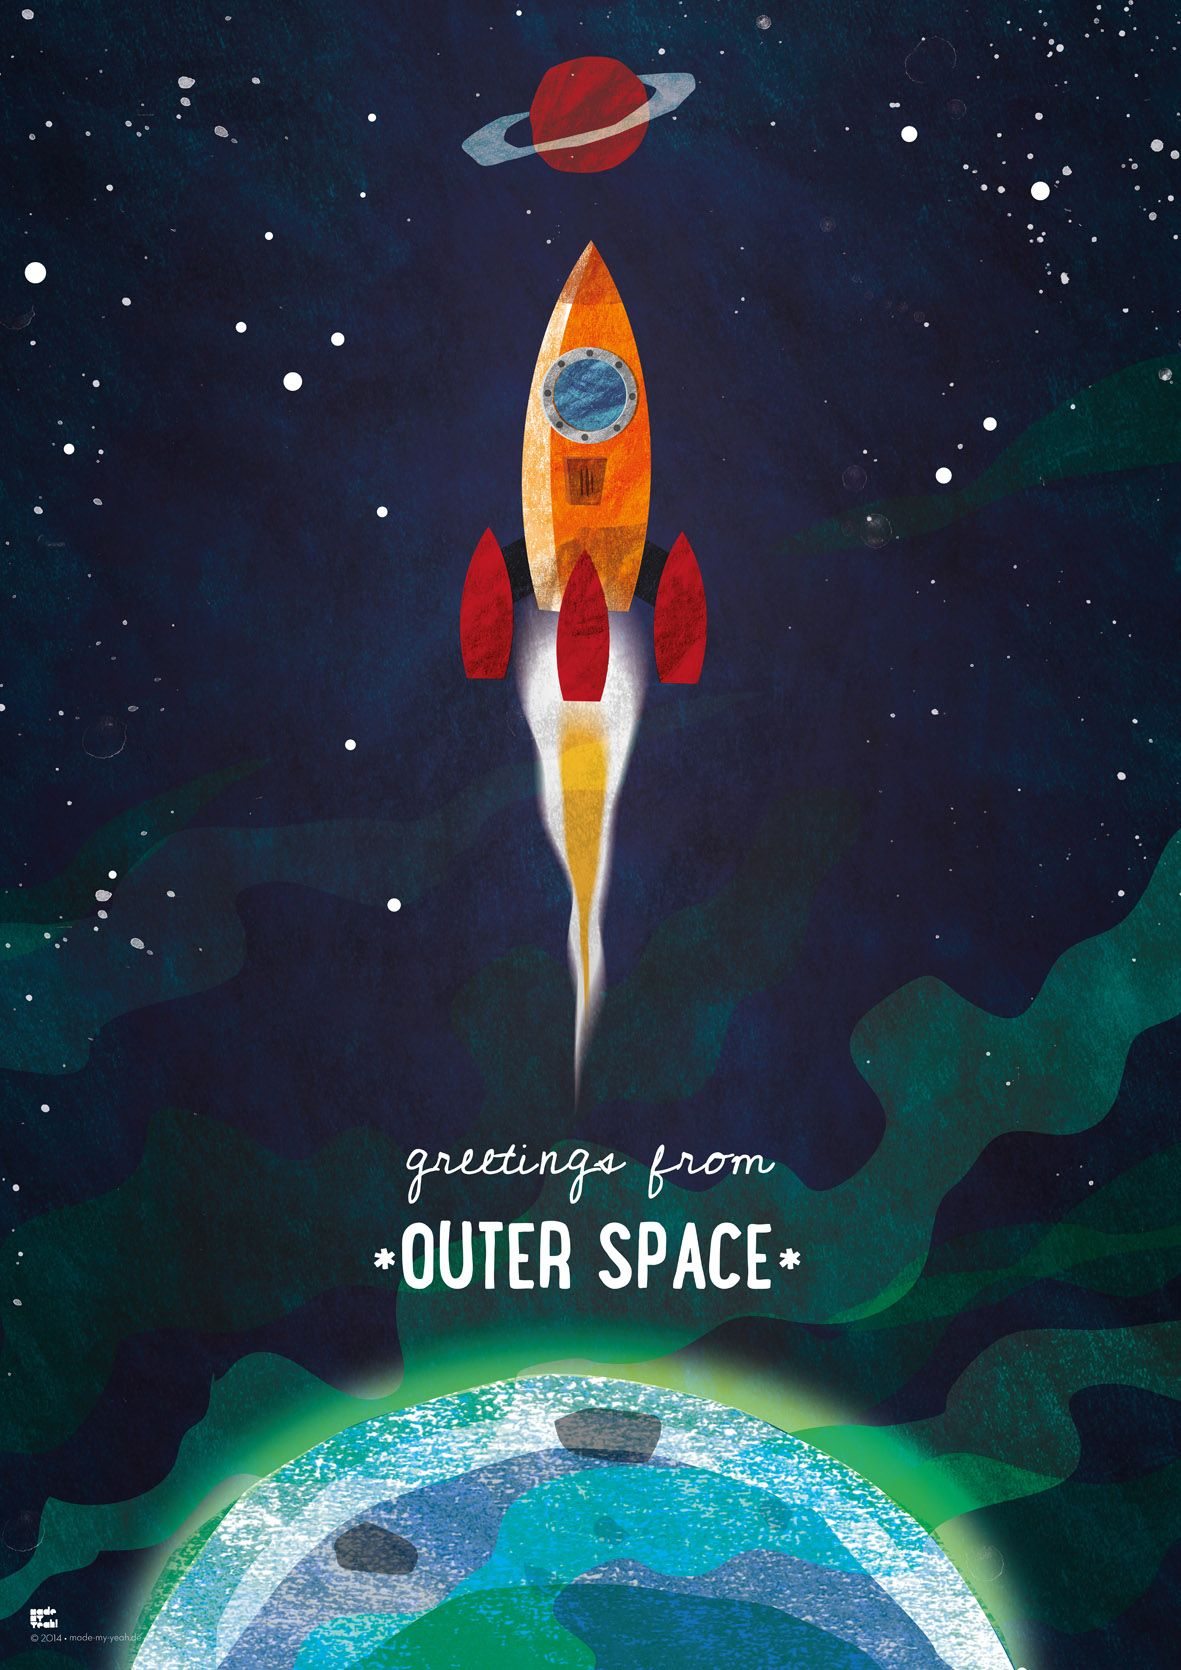 "Kinderzimmer-Poster ""Greetings from Outer Space"" mit Rakete, Sternen und Planeten …"